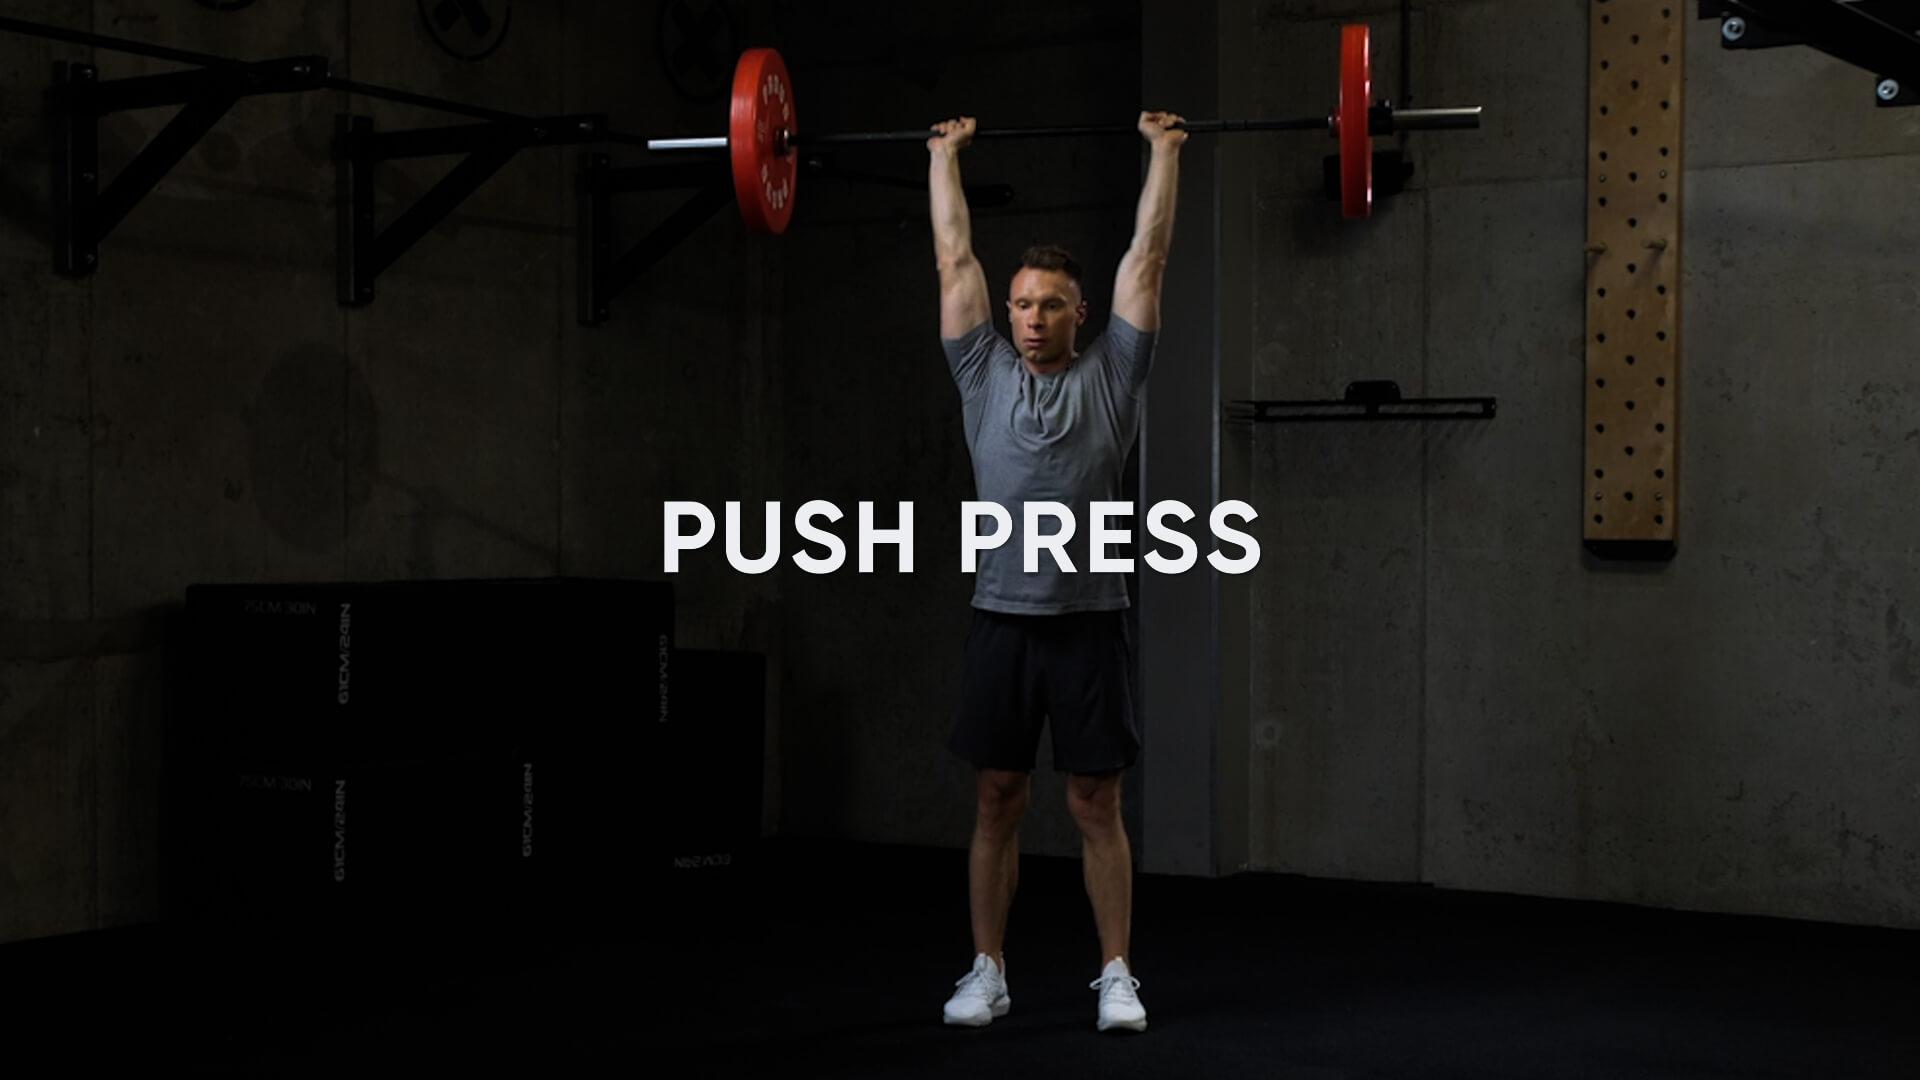 Push Press